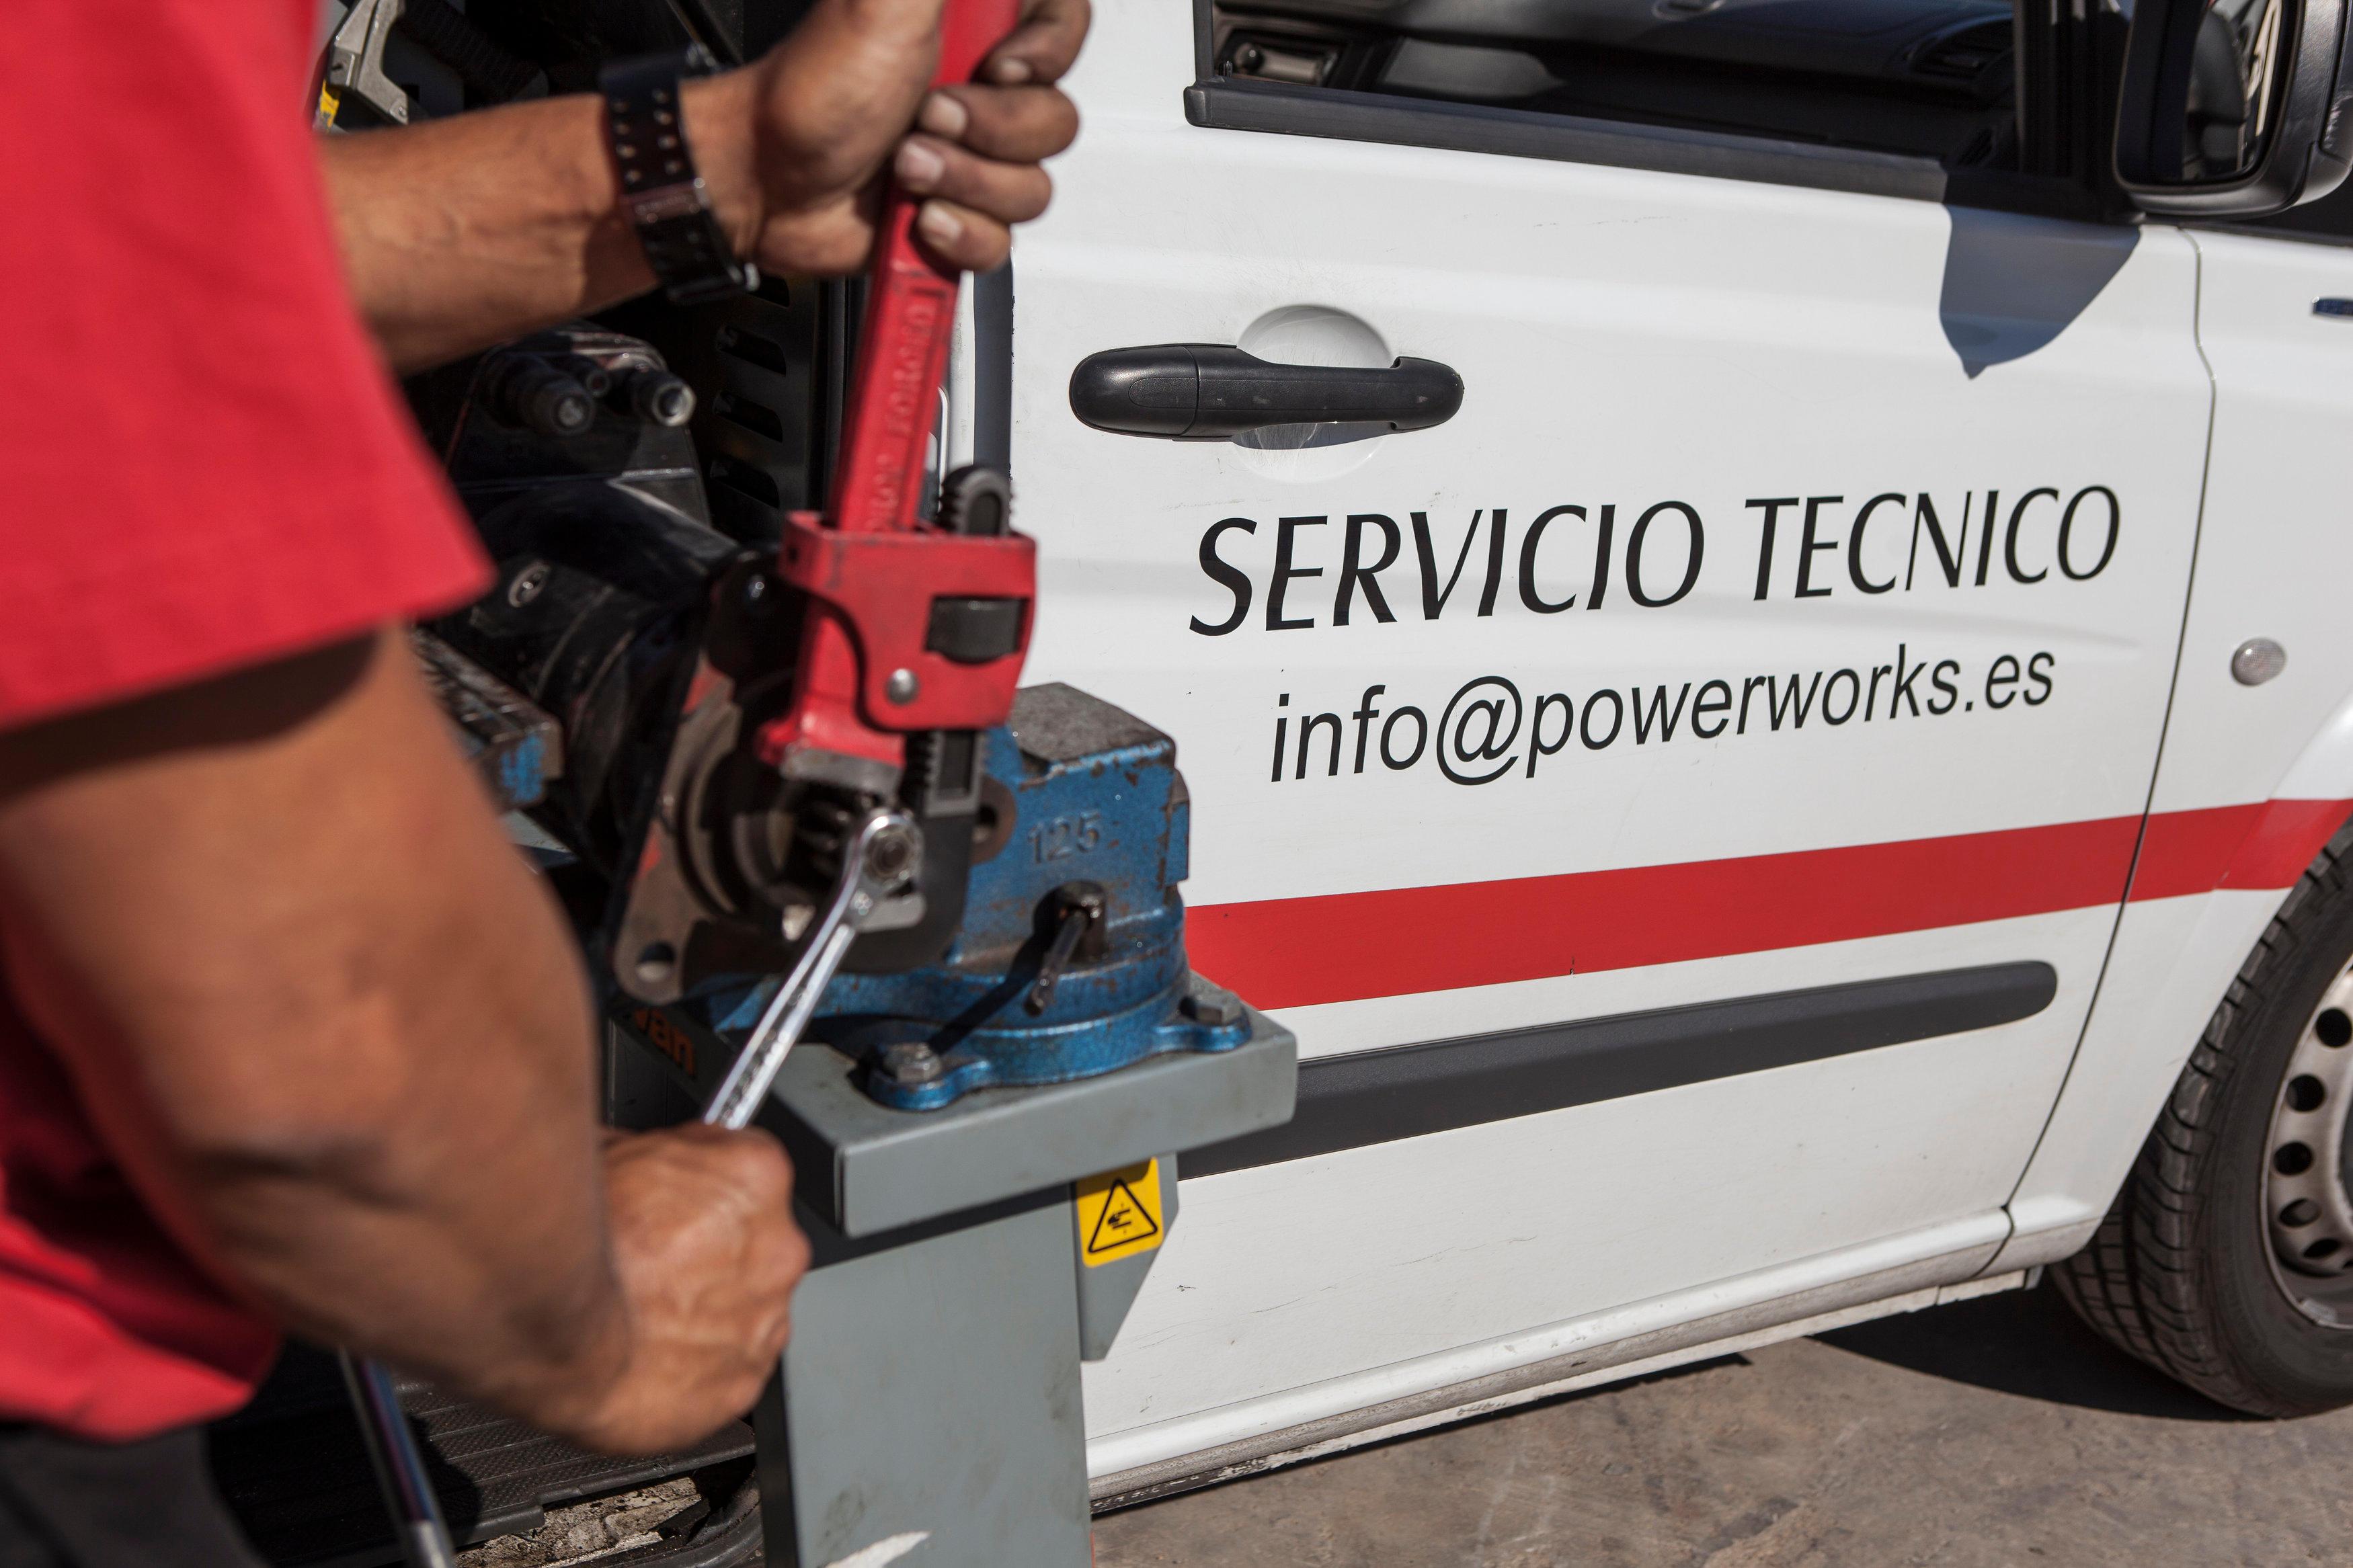 Power Works Grupos Electrogenos, S.L.